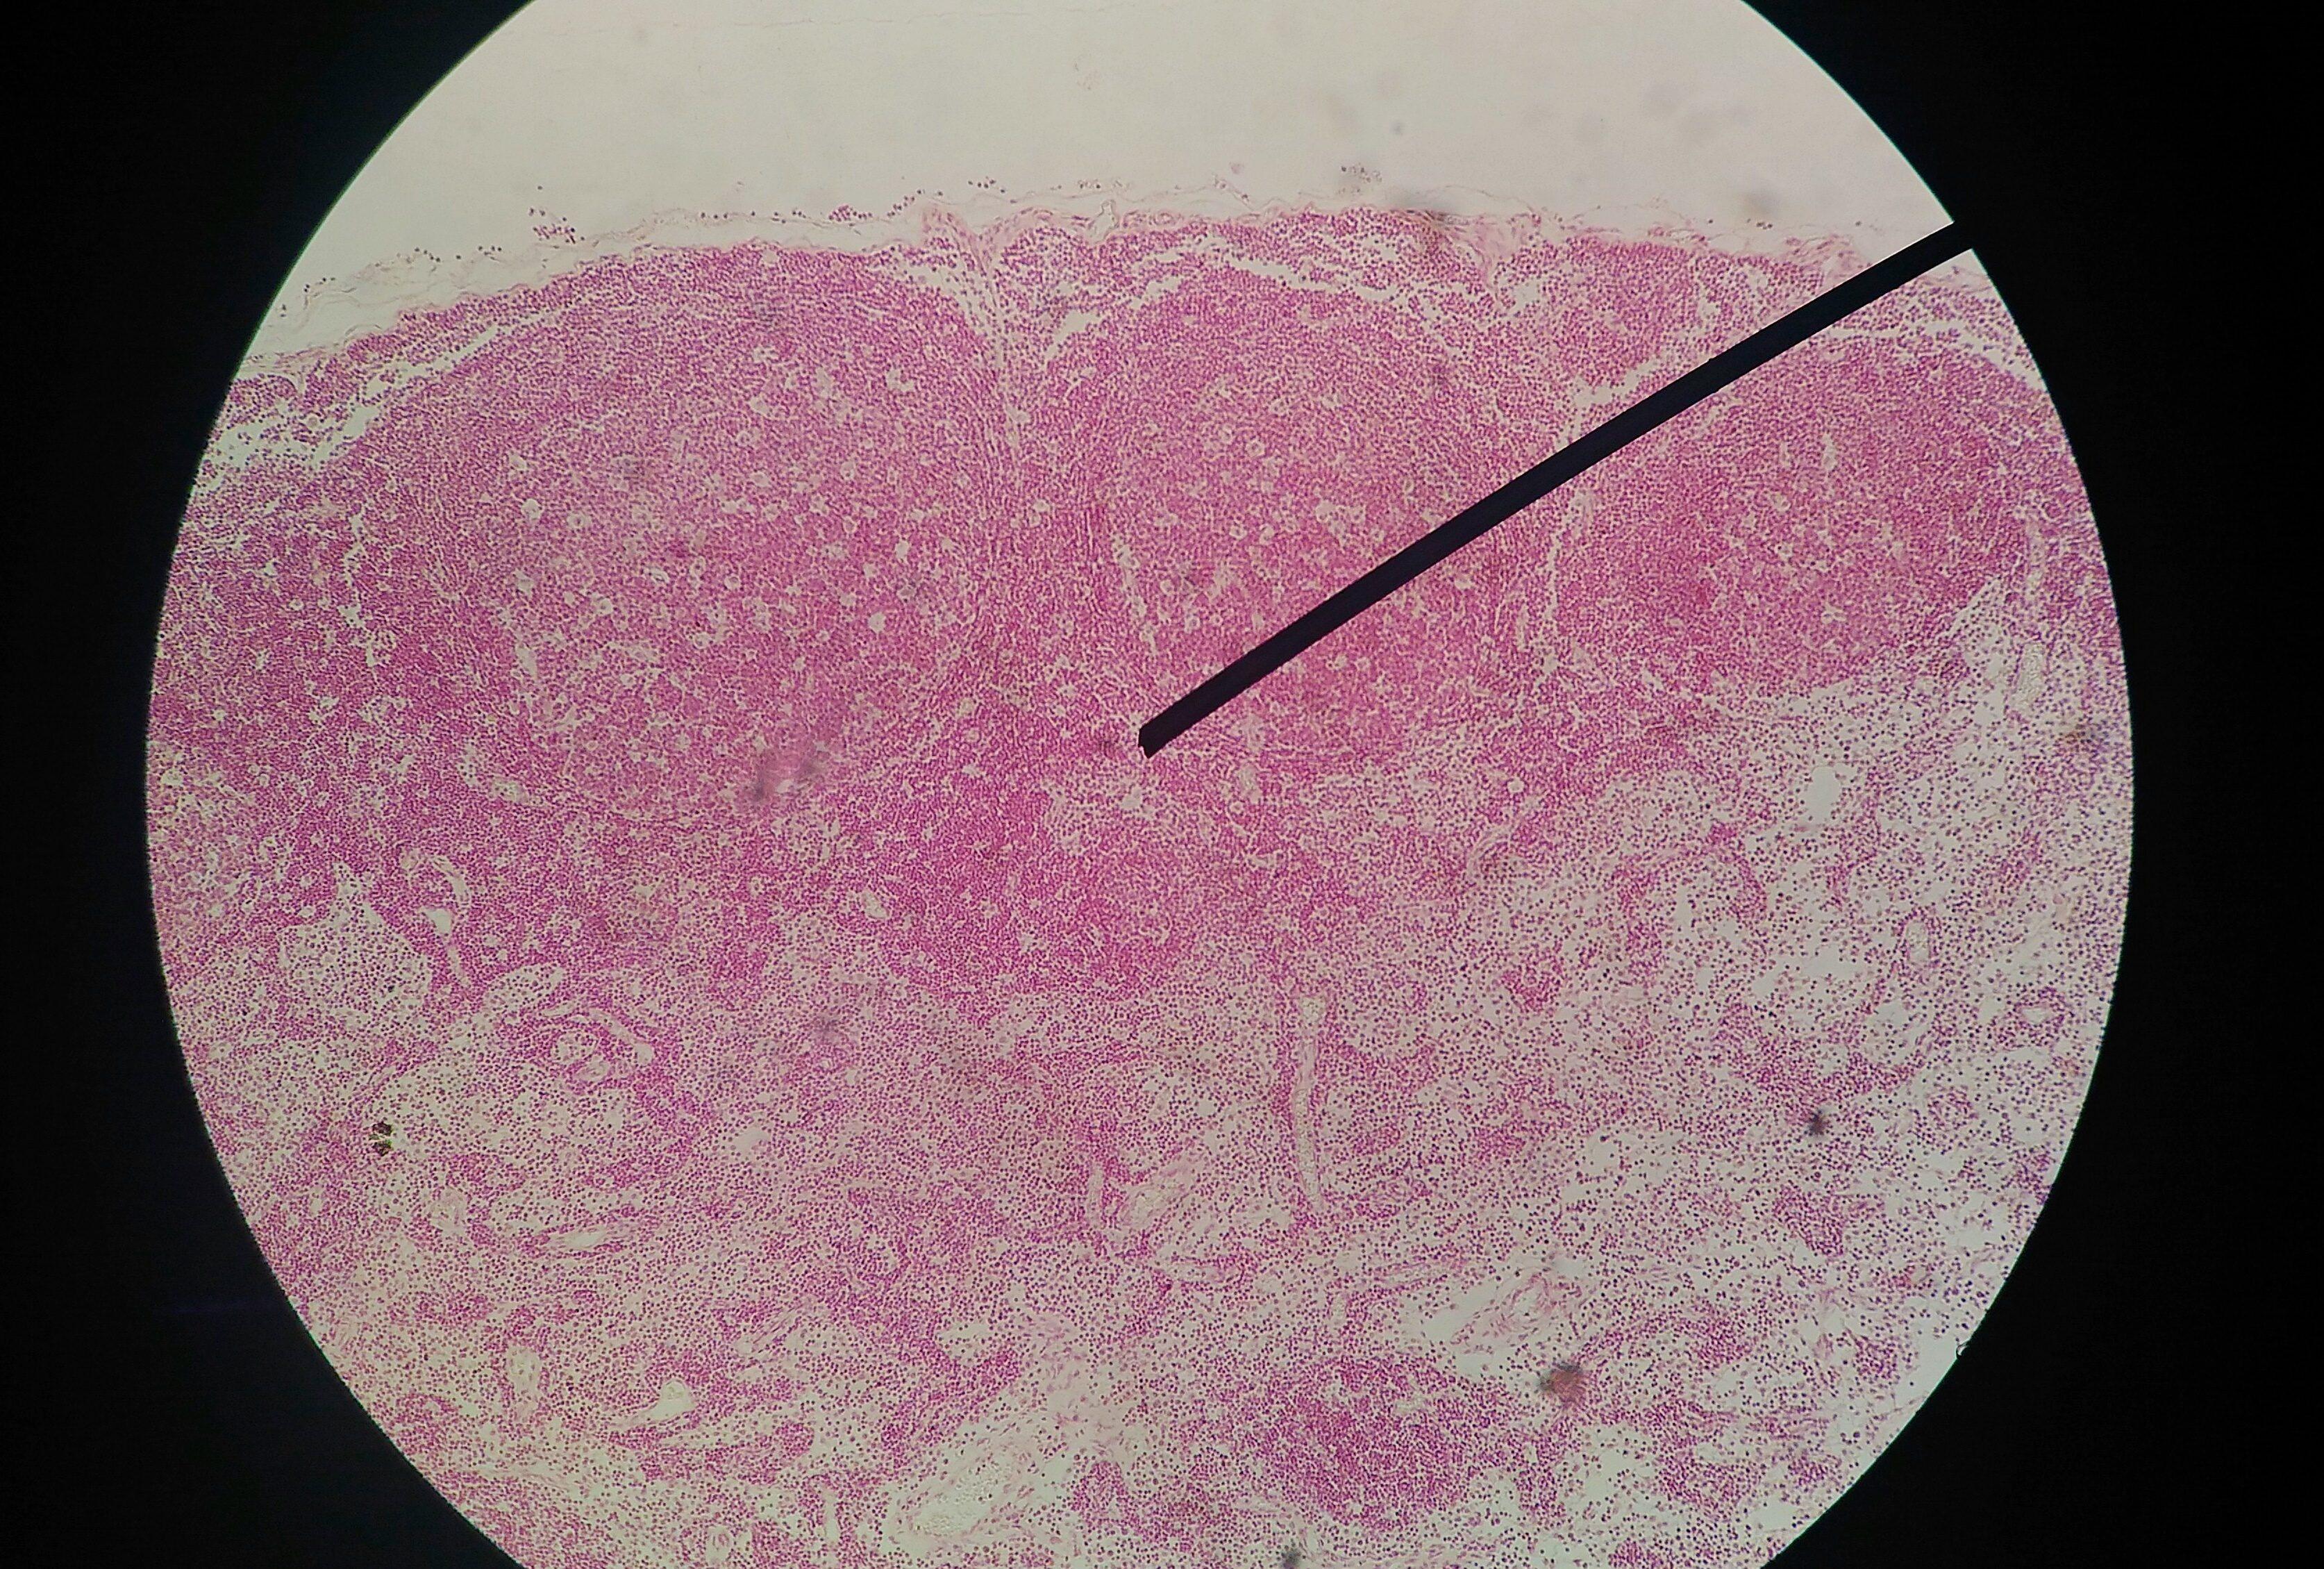 test per il papilloma virus uomo ktp laser laryngeal papilloma